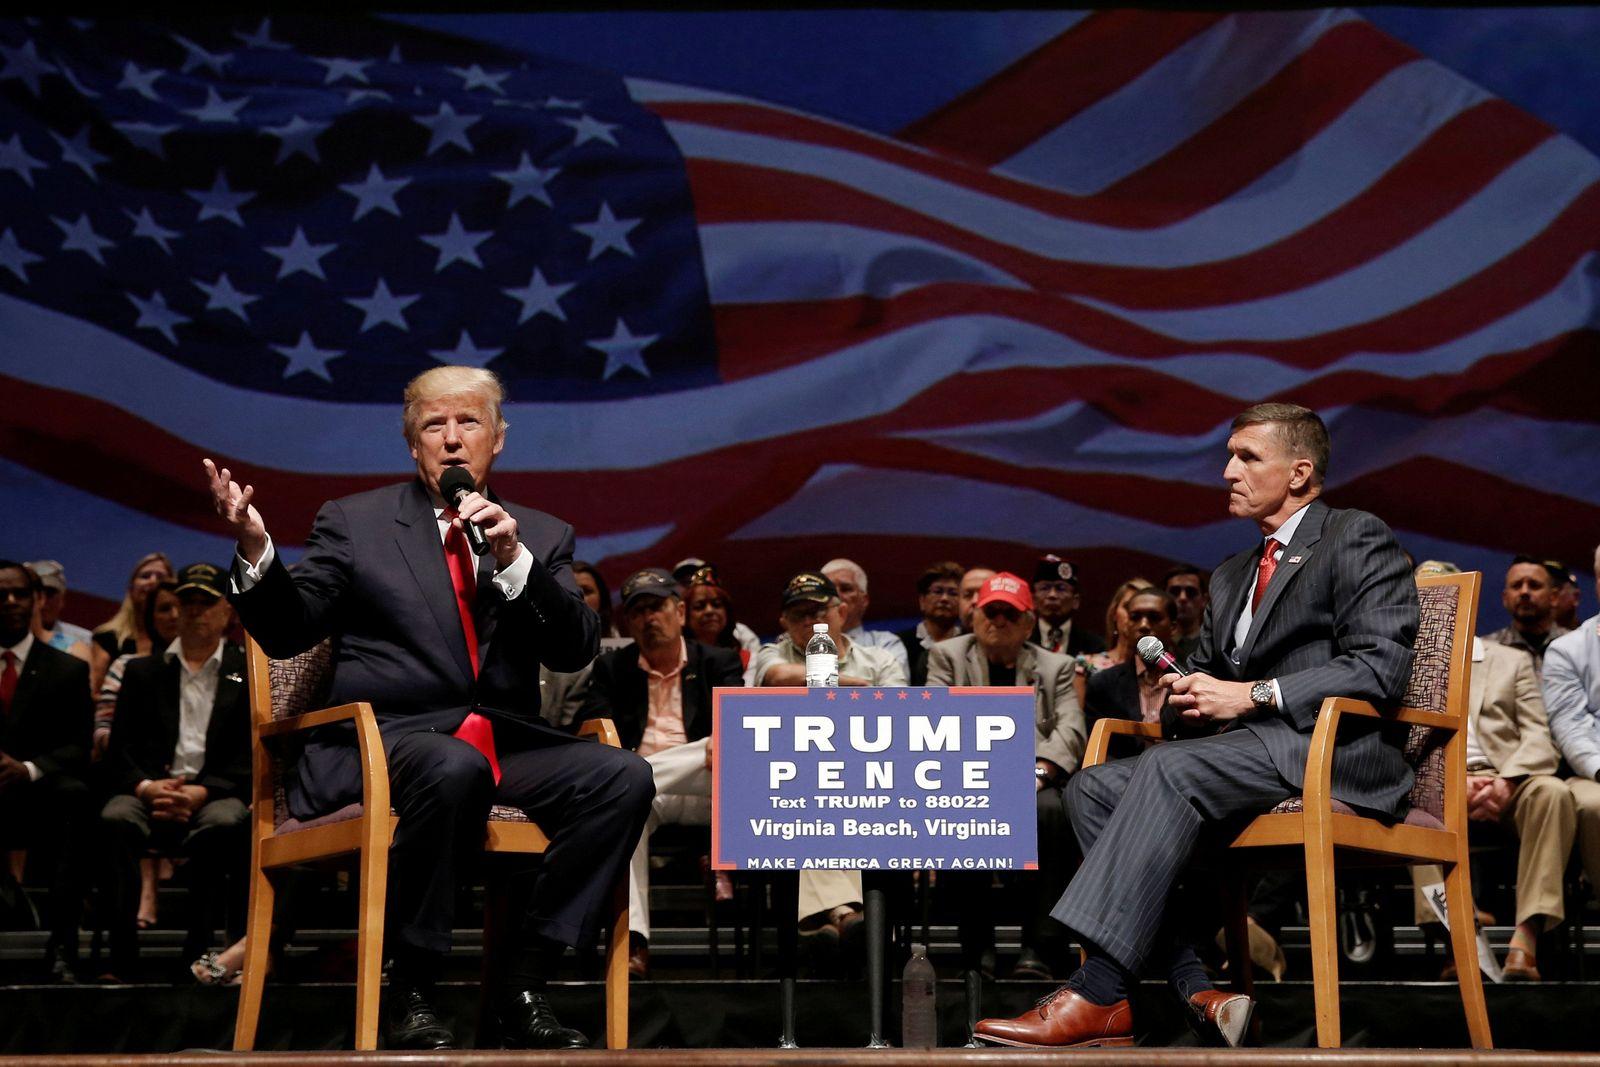 Michael Flynn / Donald Trump